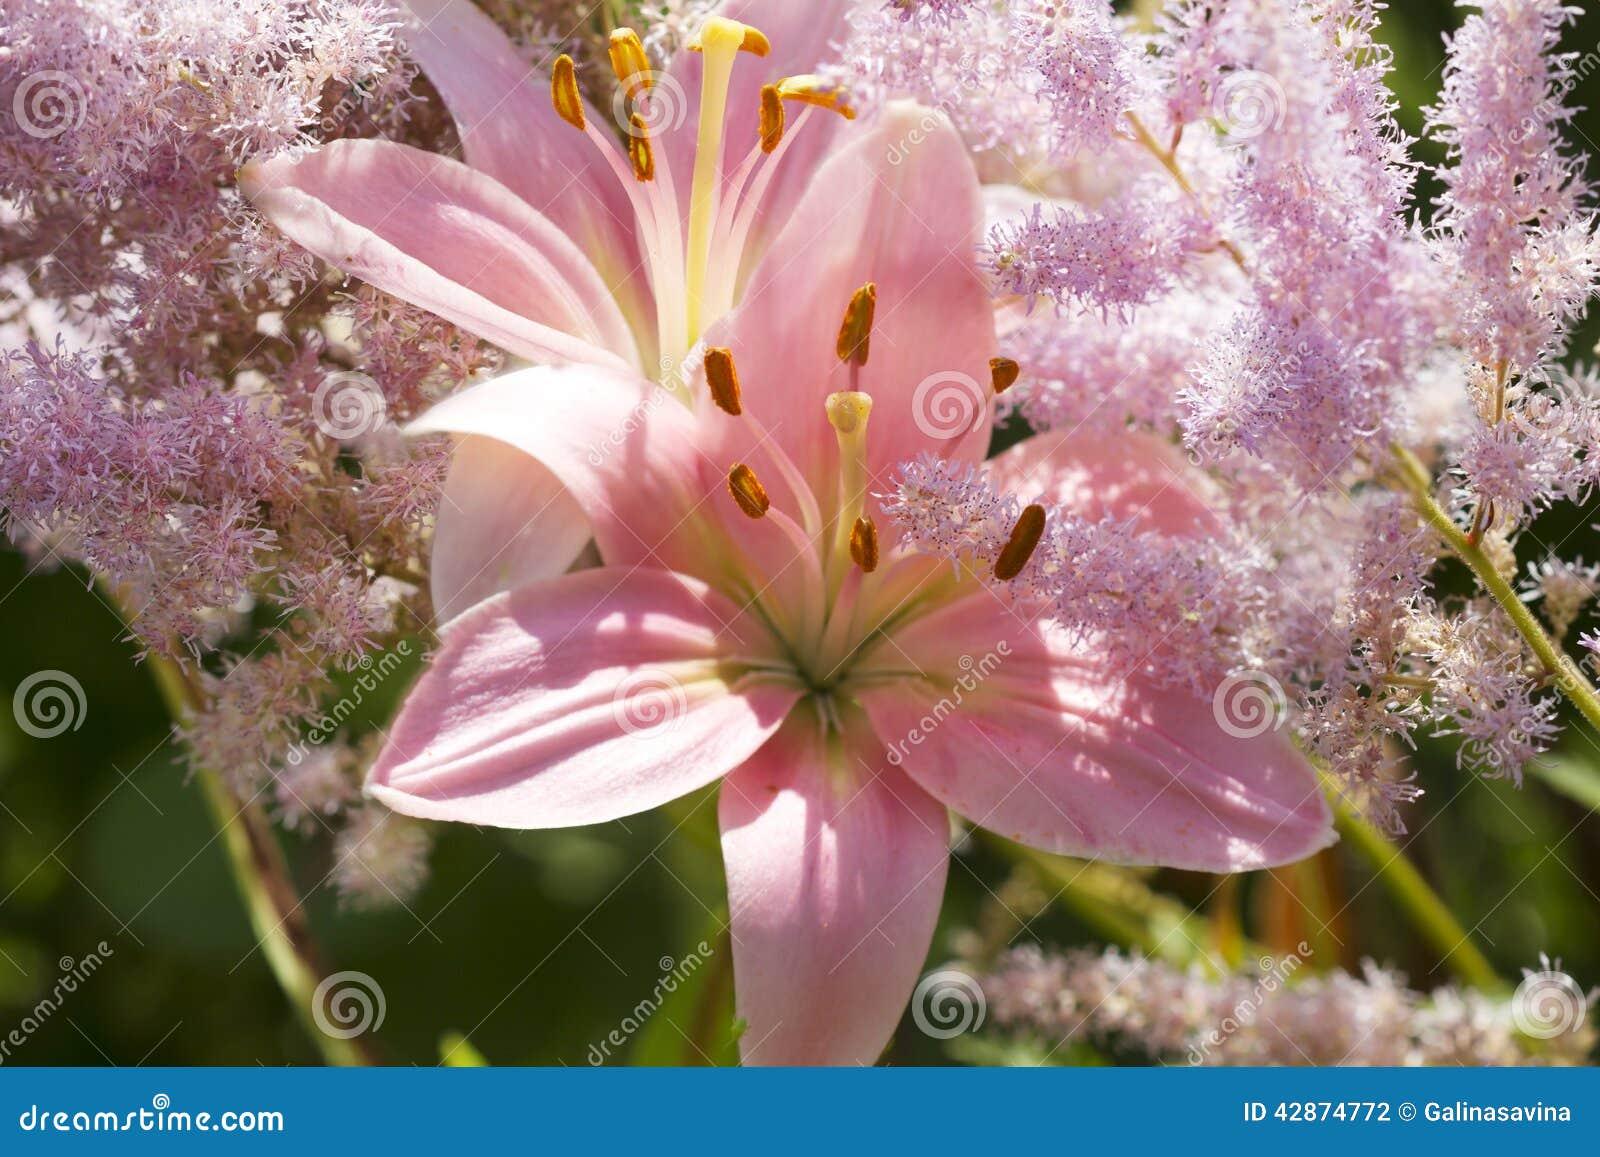 Lily Princess Flora Stock Photo Image Of Petals Lily 42874772